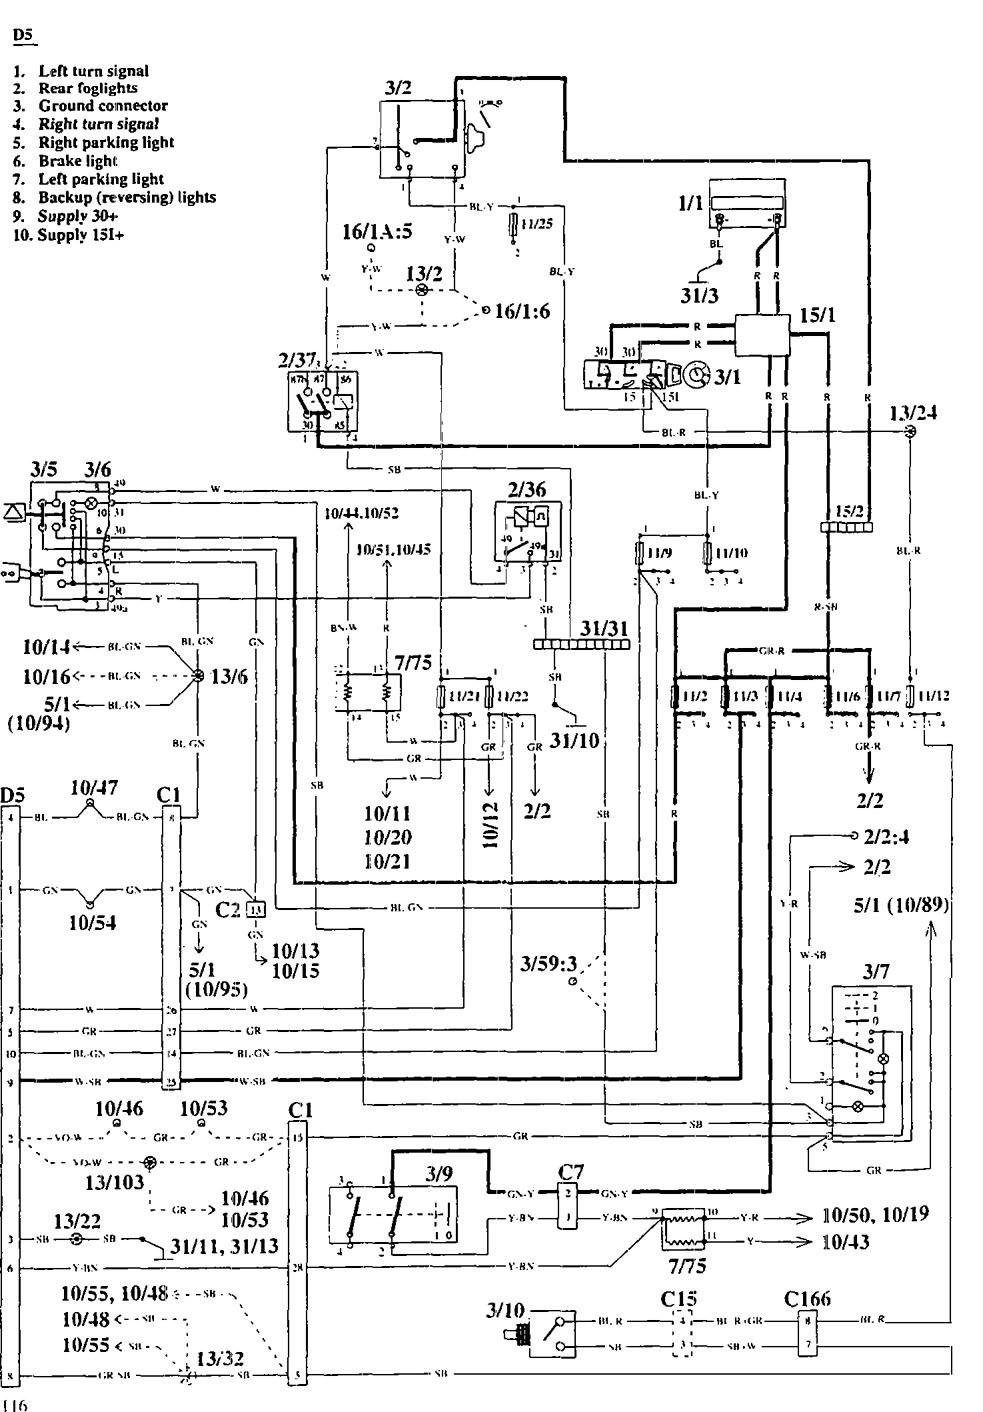 peugeot 103 wiring diagram volvo 940  1995  wiring diagrams trailer camper adapter  volvo 940  1995  wiring diagrams